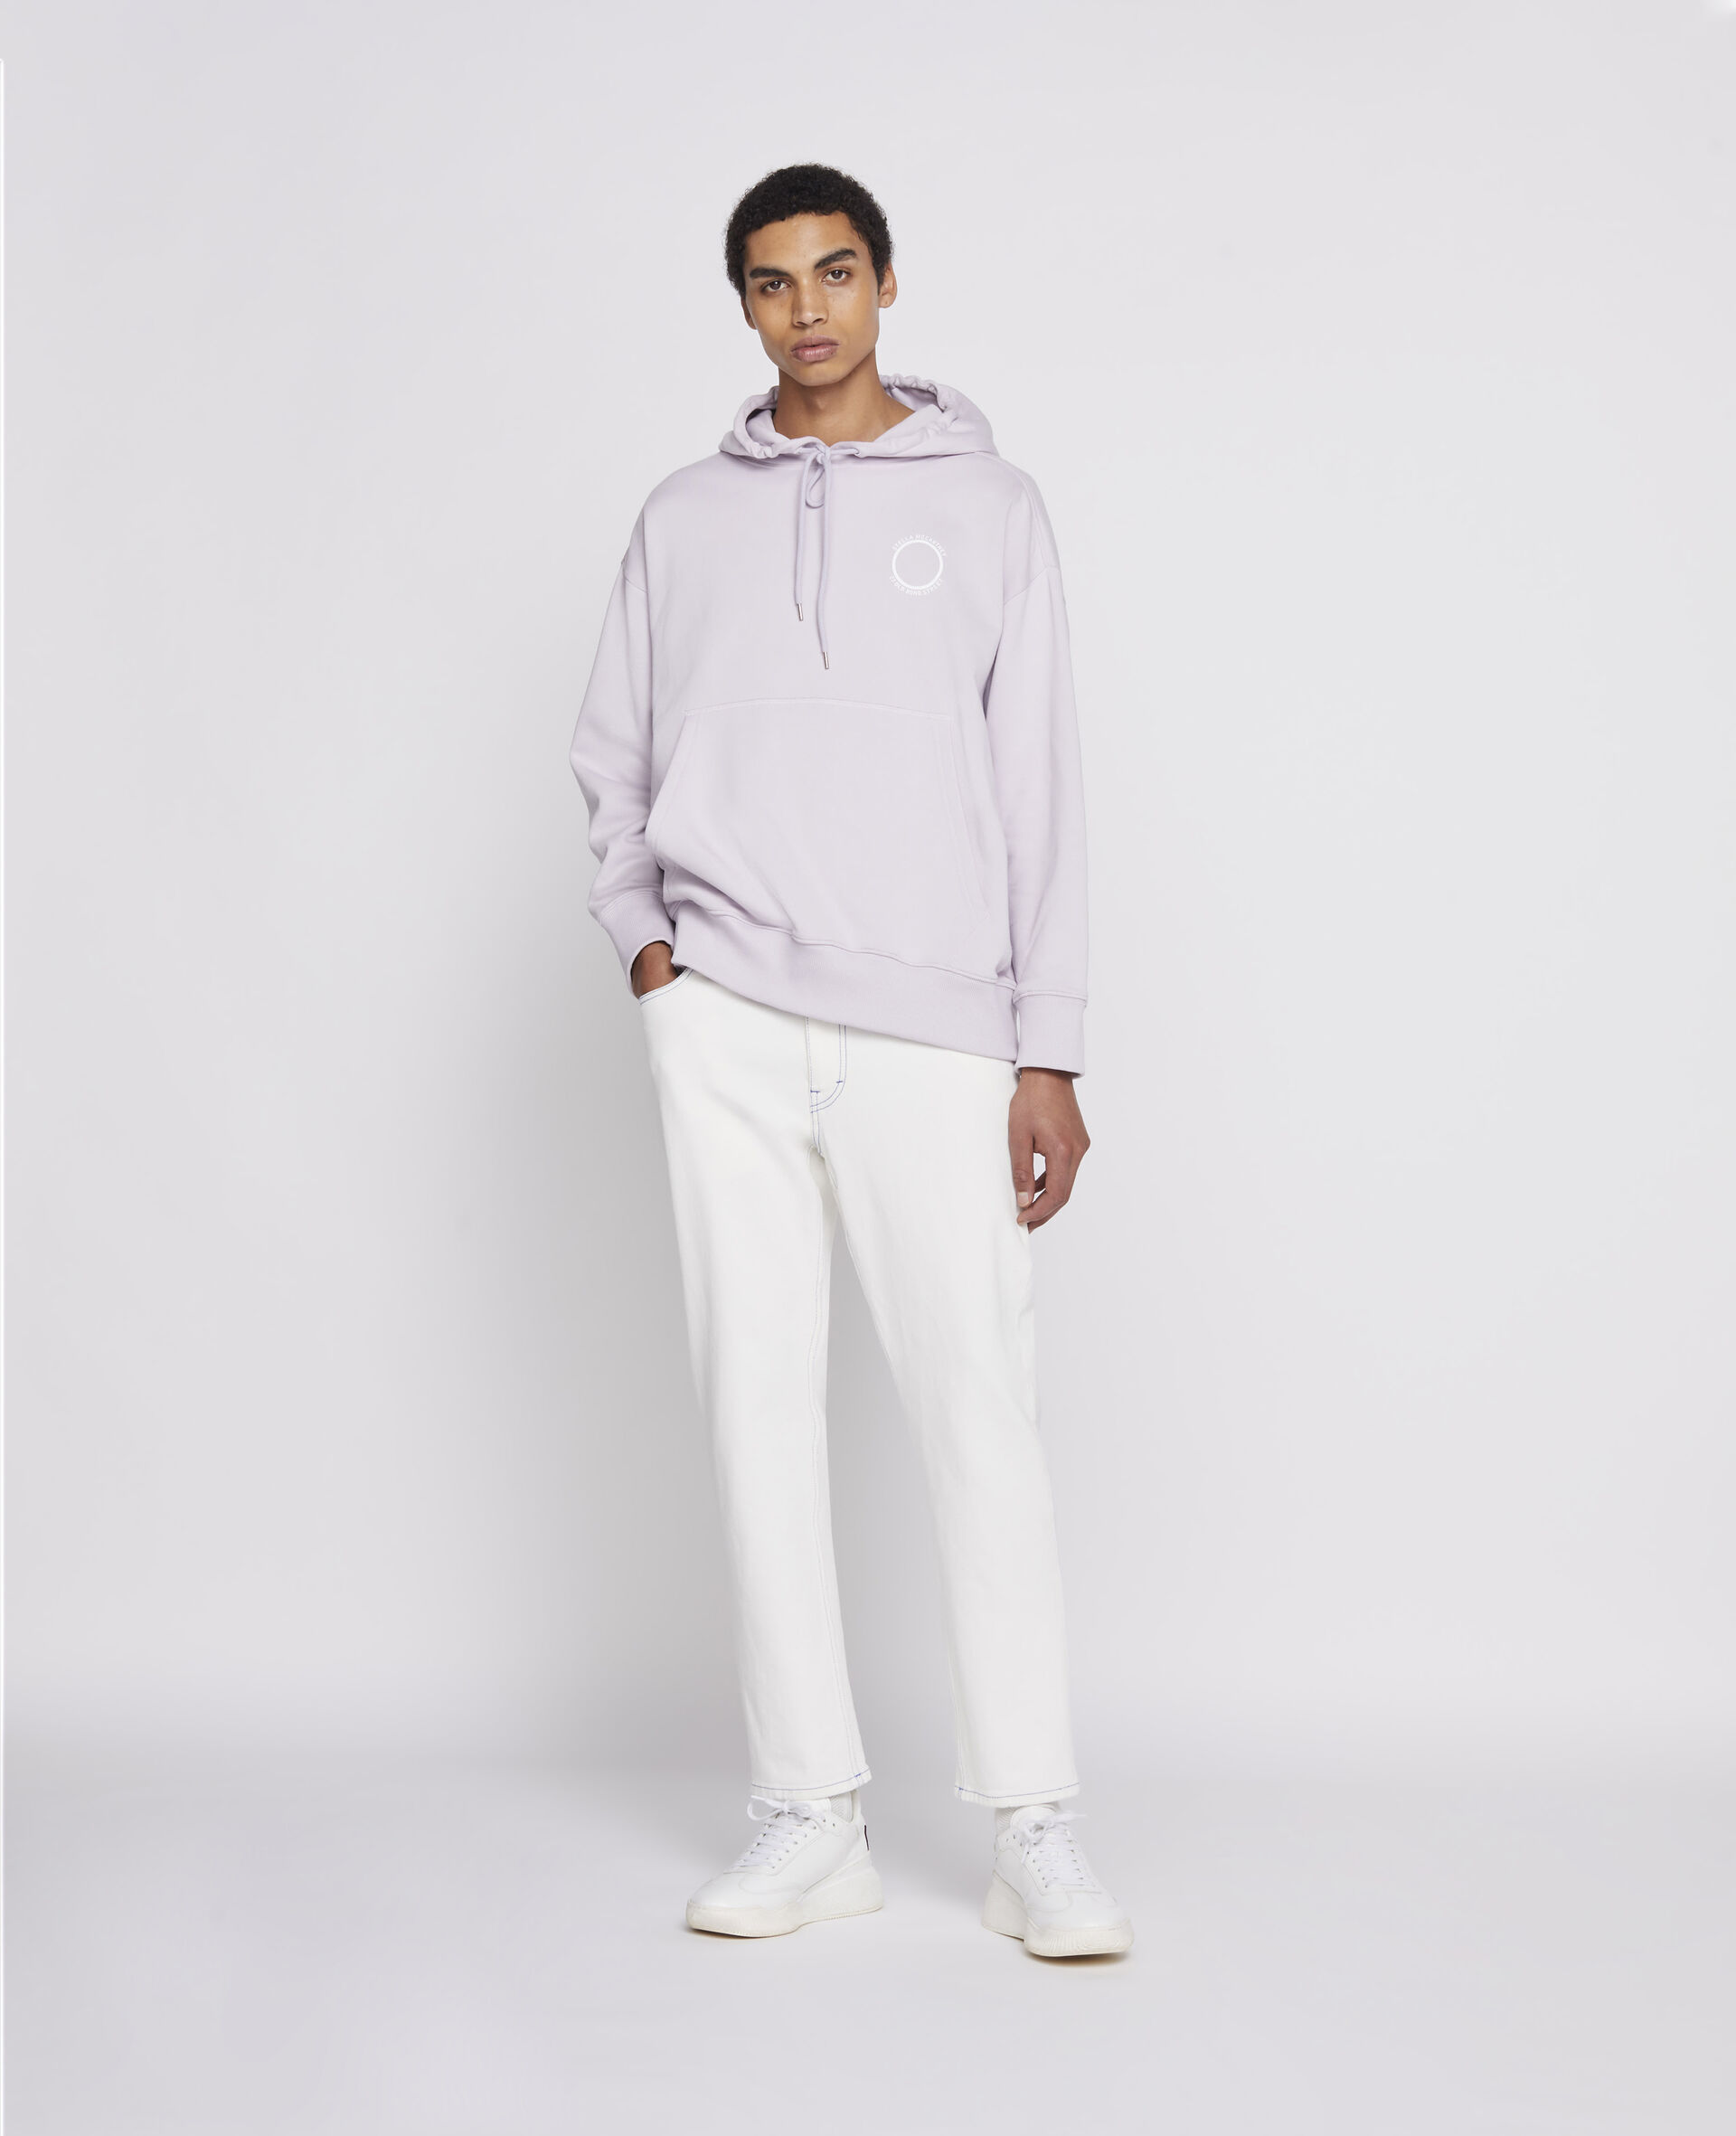 Pantaloni in Denim 23 OBS  -Bianco-large image number 1